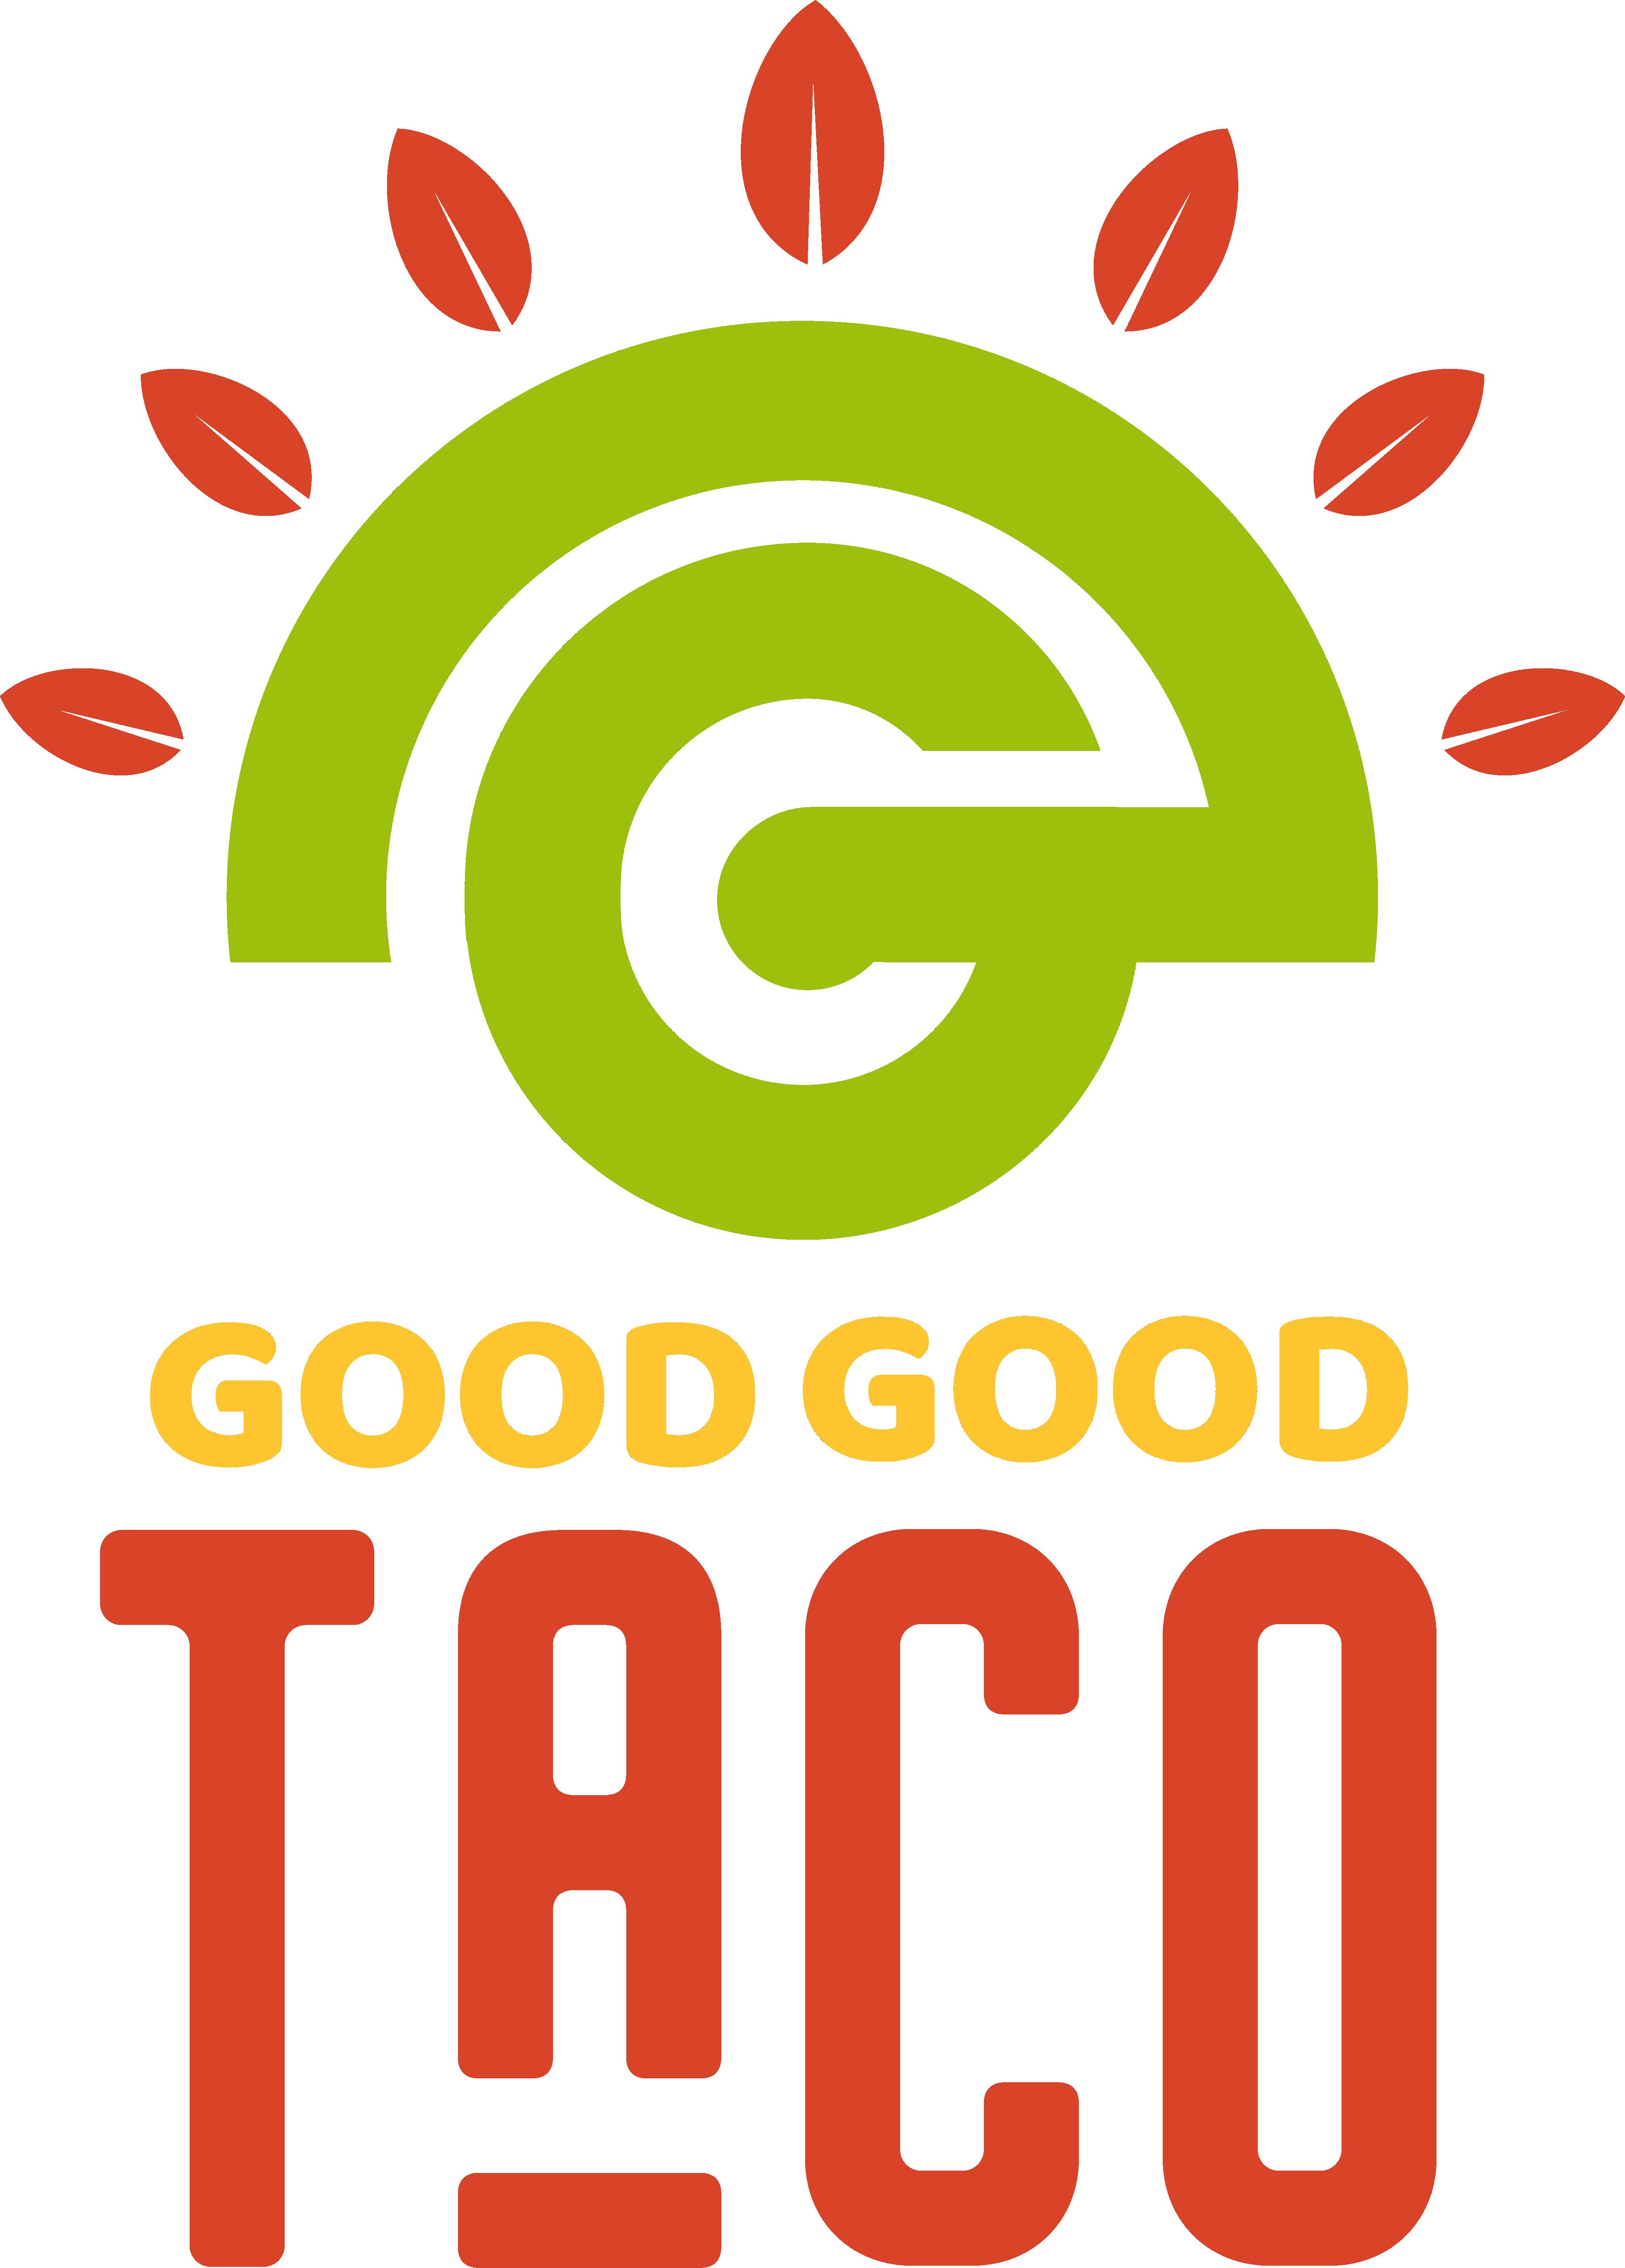 Design a logo for a HEALTHY TACO business!